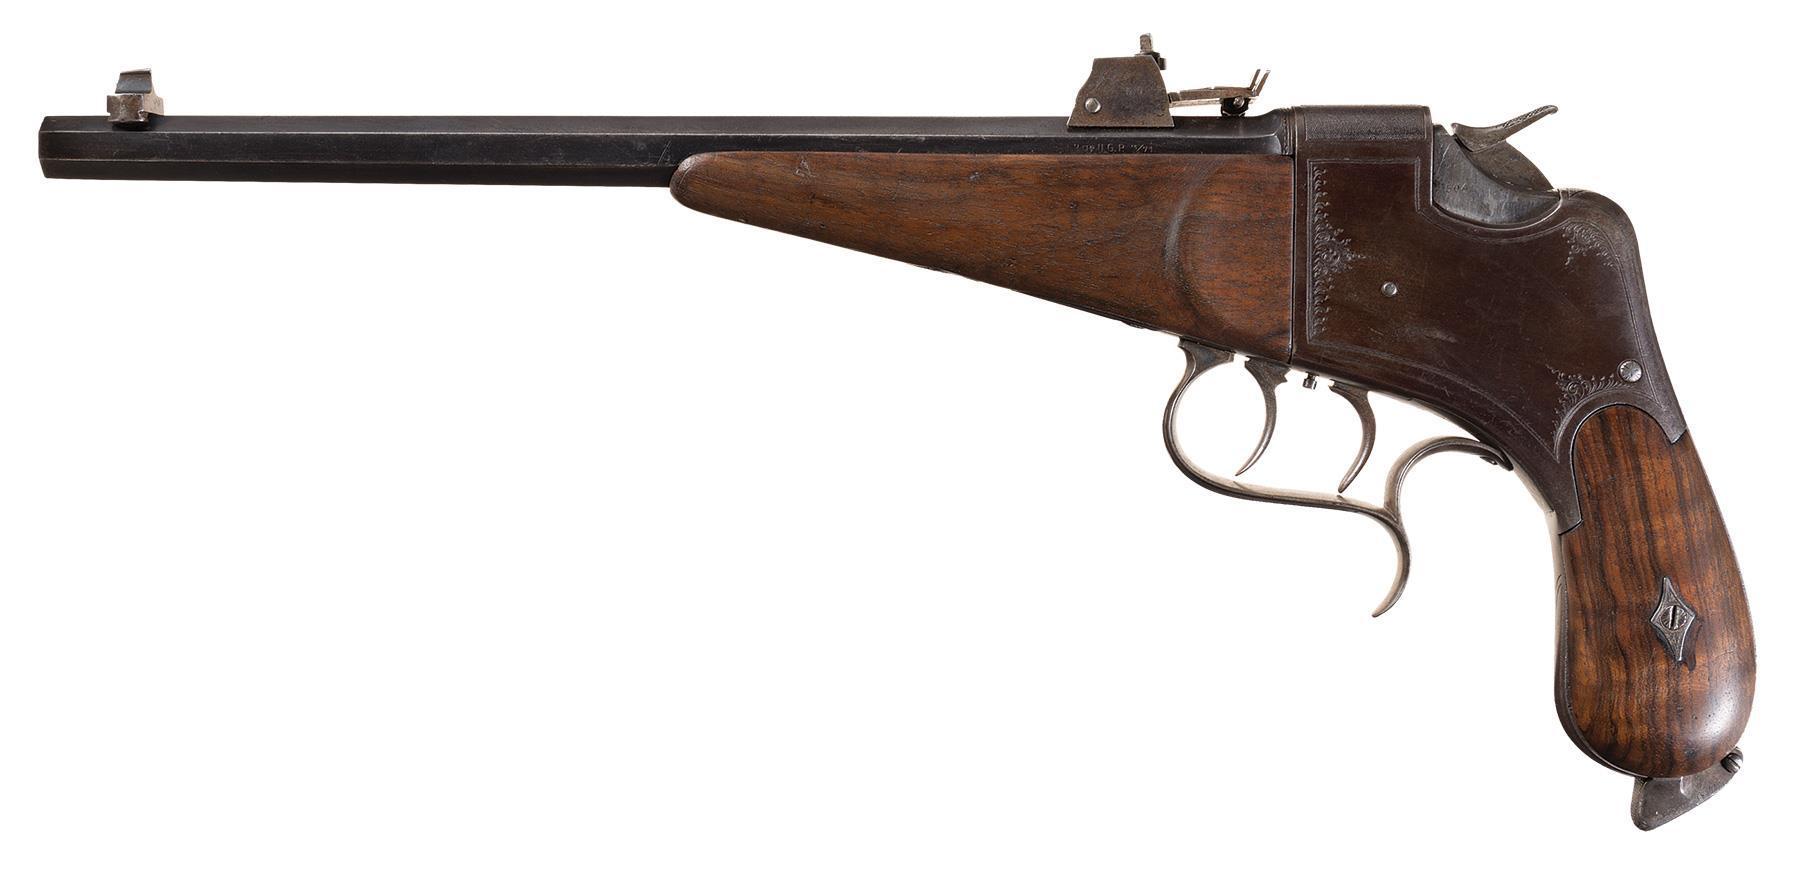 The Tell pistol was the predecessor of the Luna.